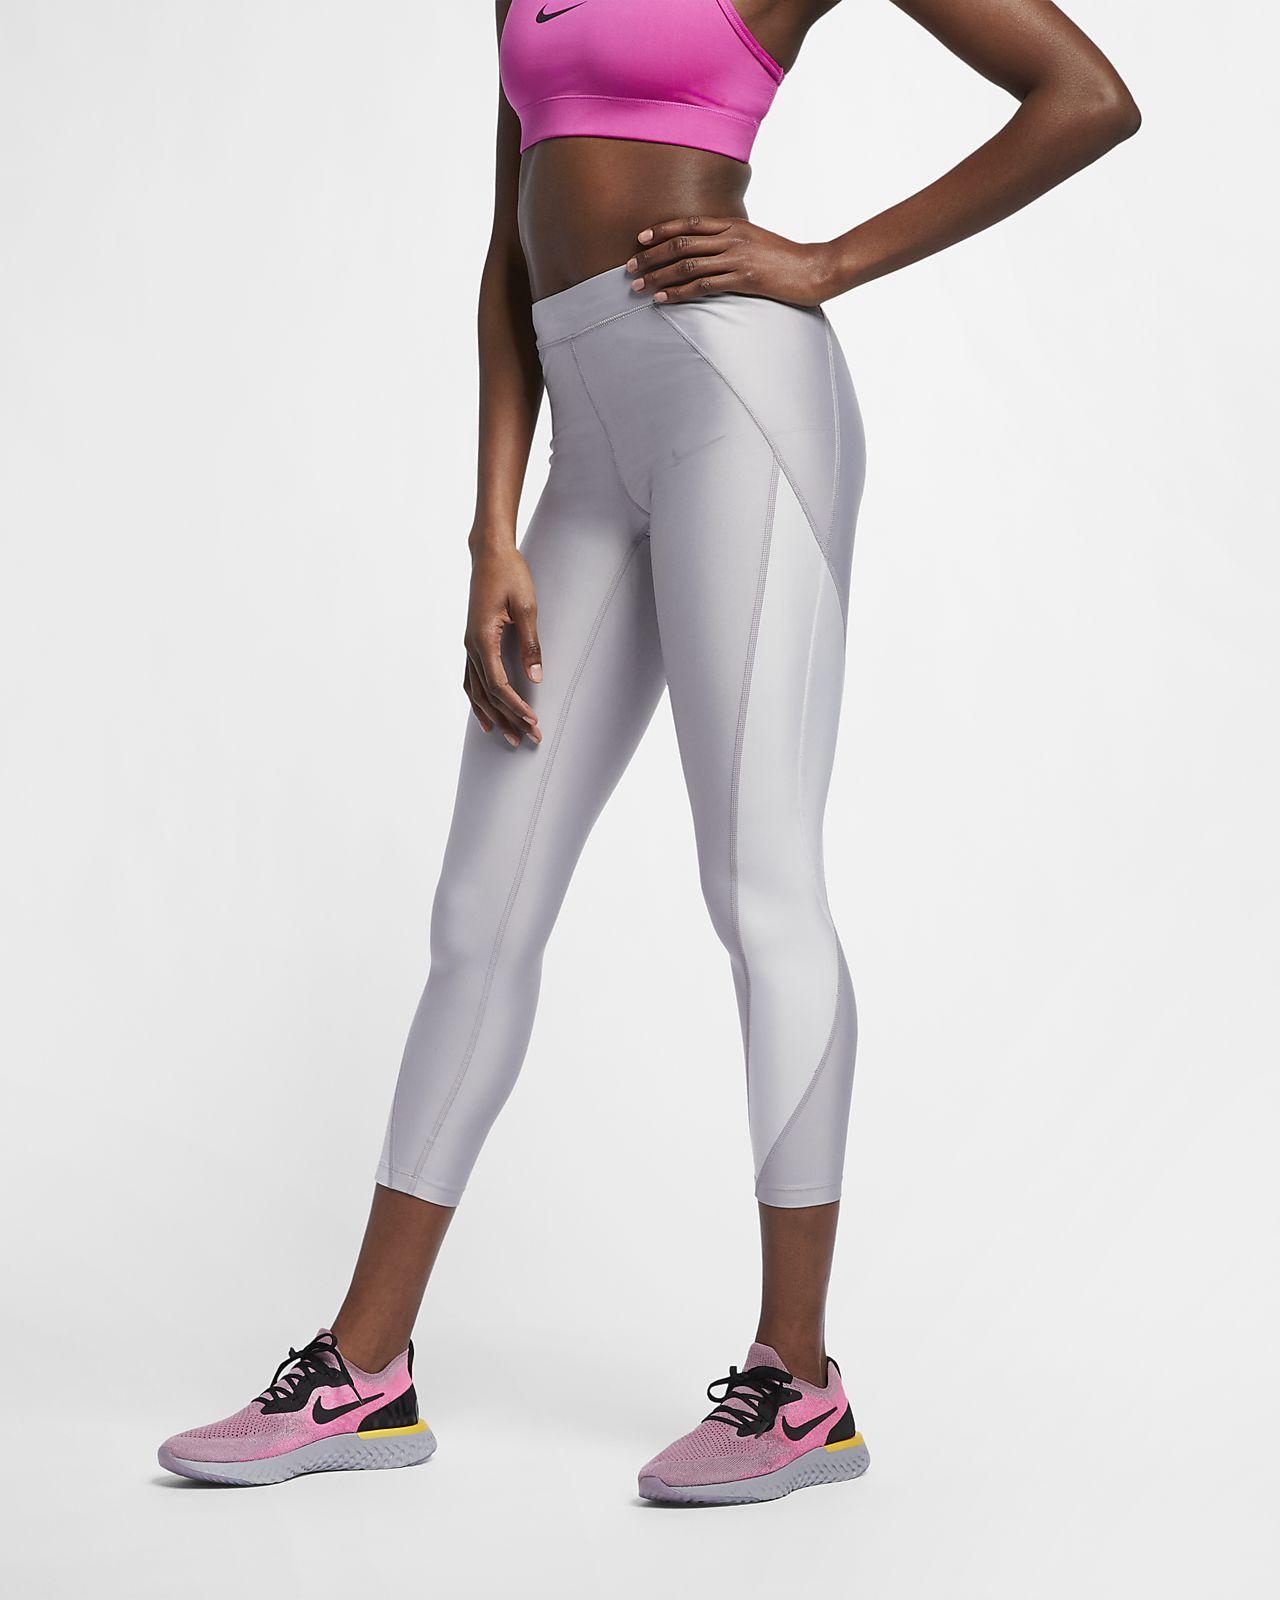 936ebe7490c Nike Speed Women s 7 8 Mid-Rise Metallic Running Tights. Nike.com ZA